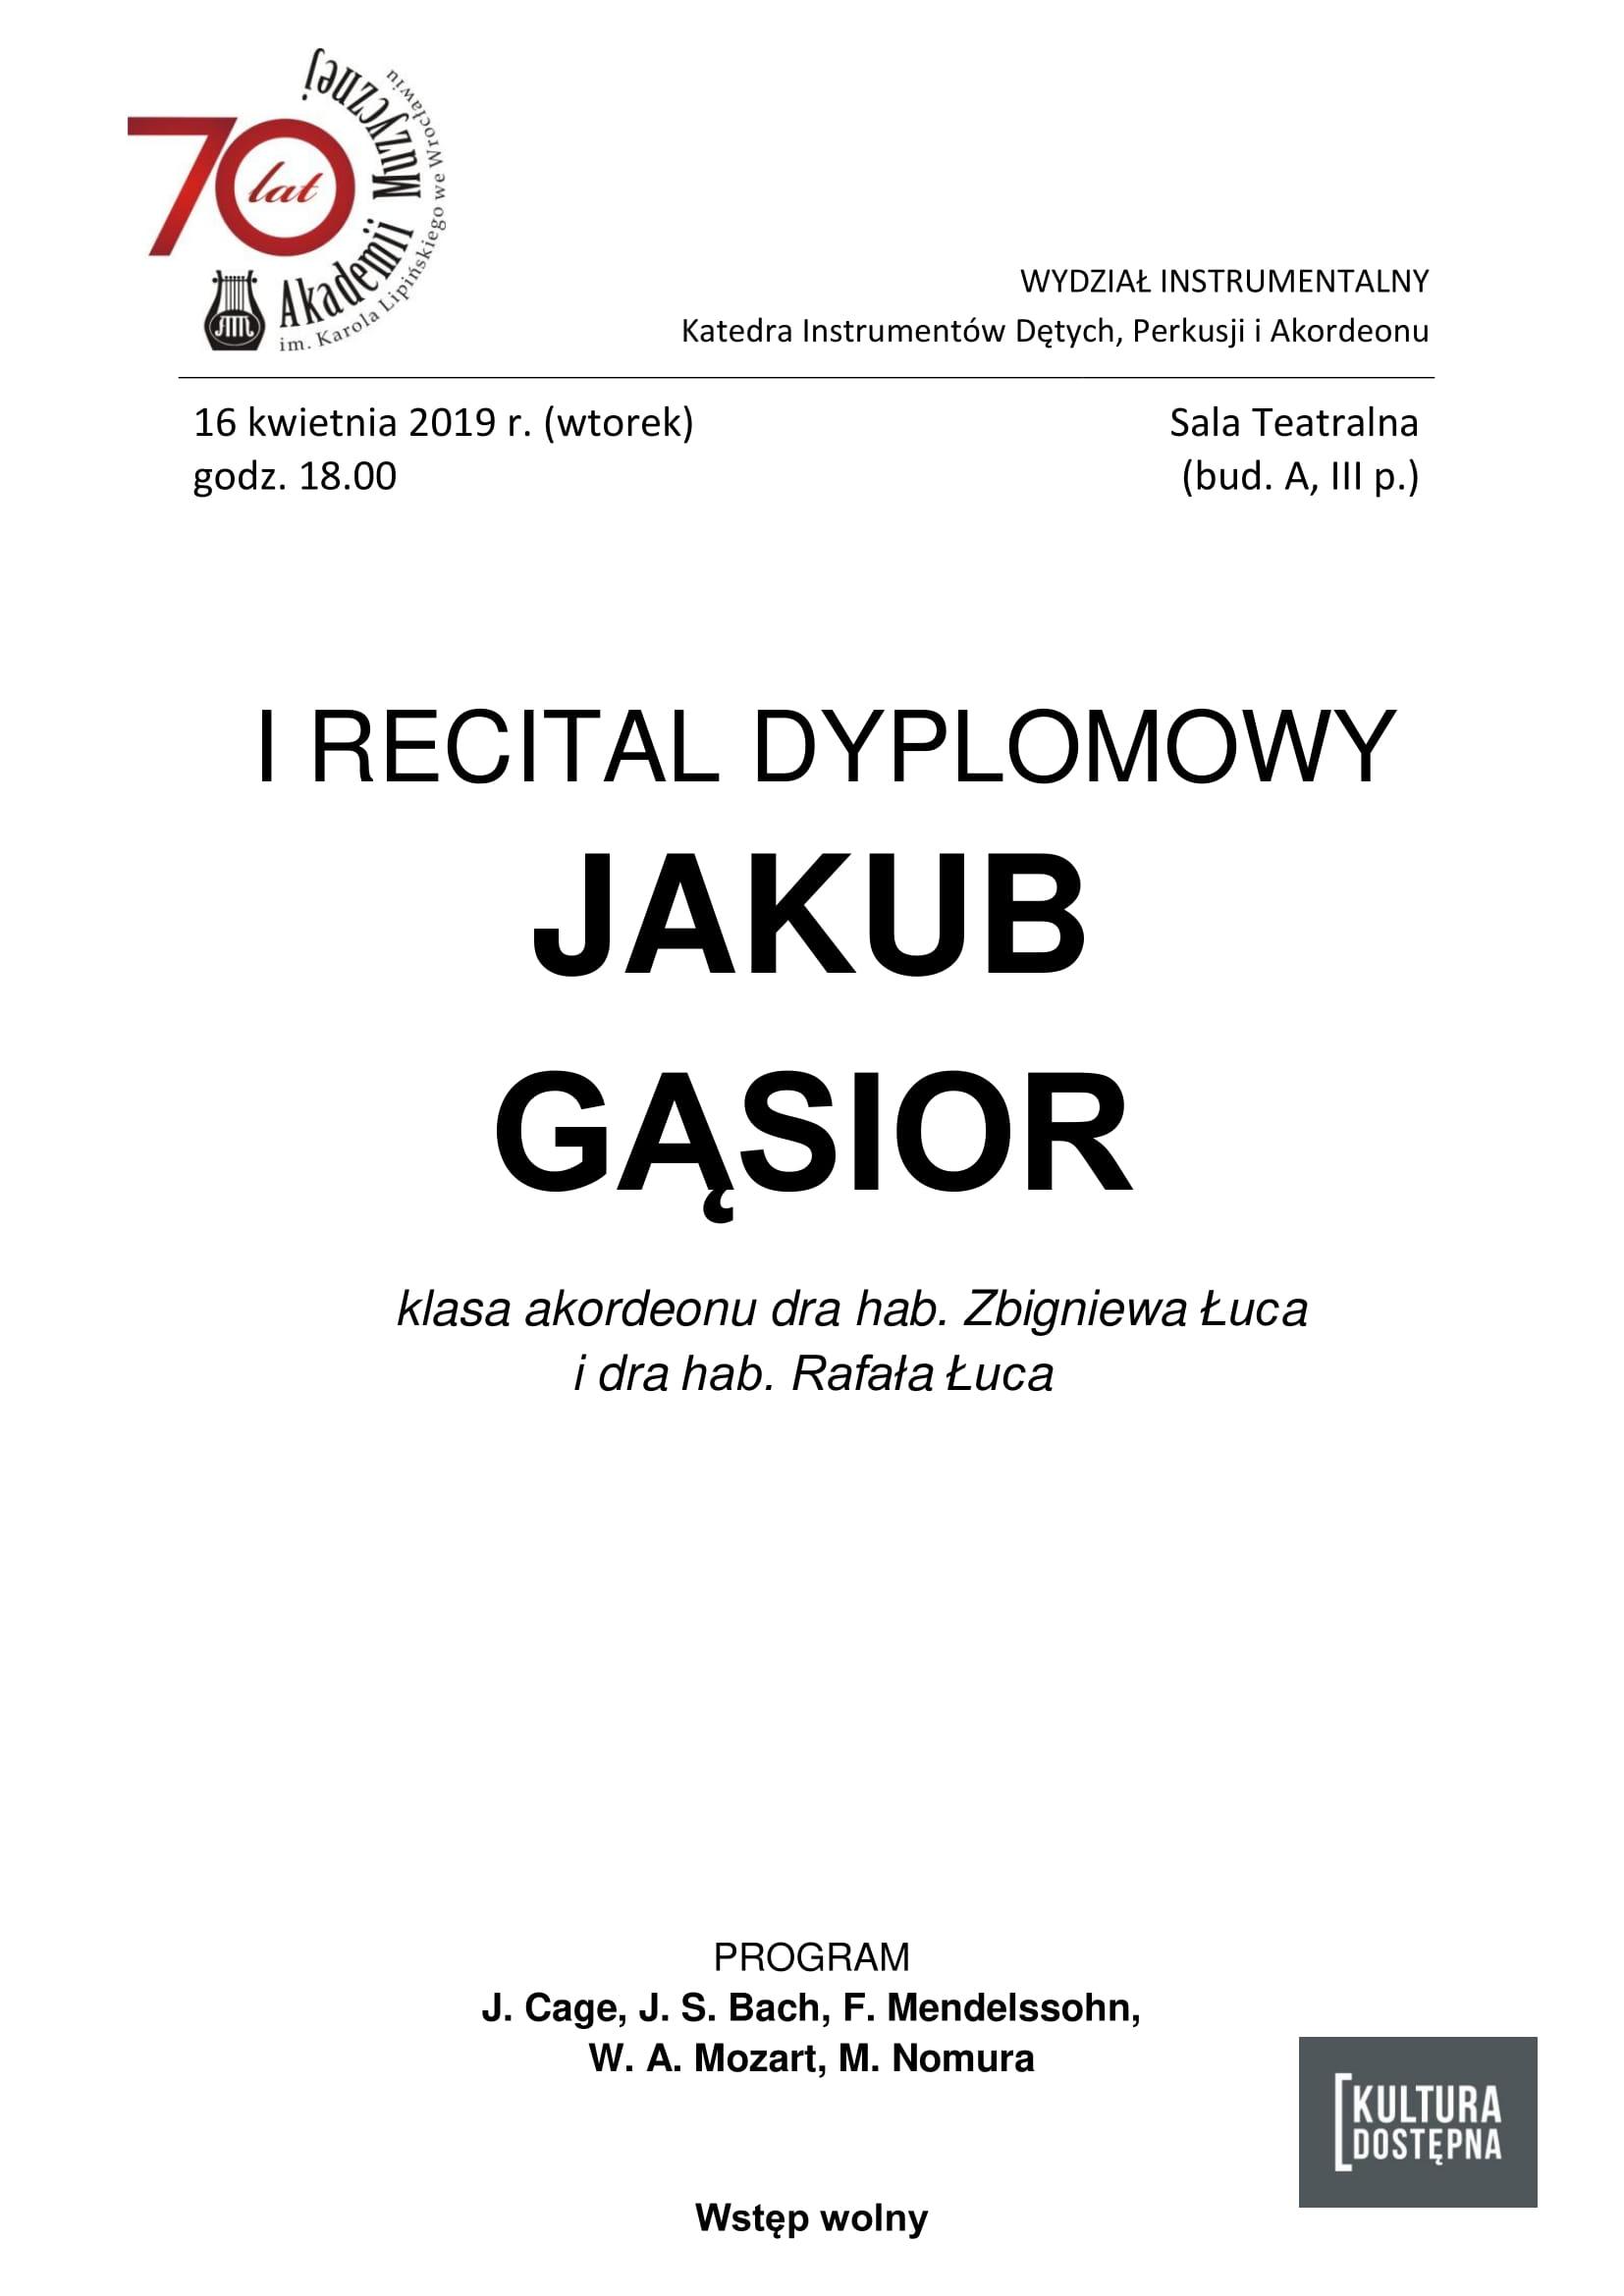 I recital dyplomowy - Jakub Gąsior (akordeon)